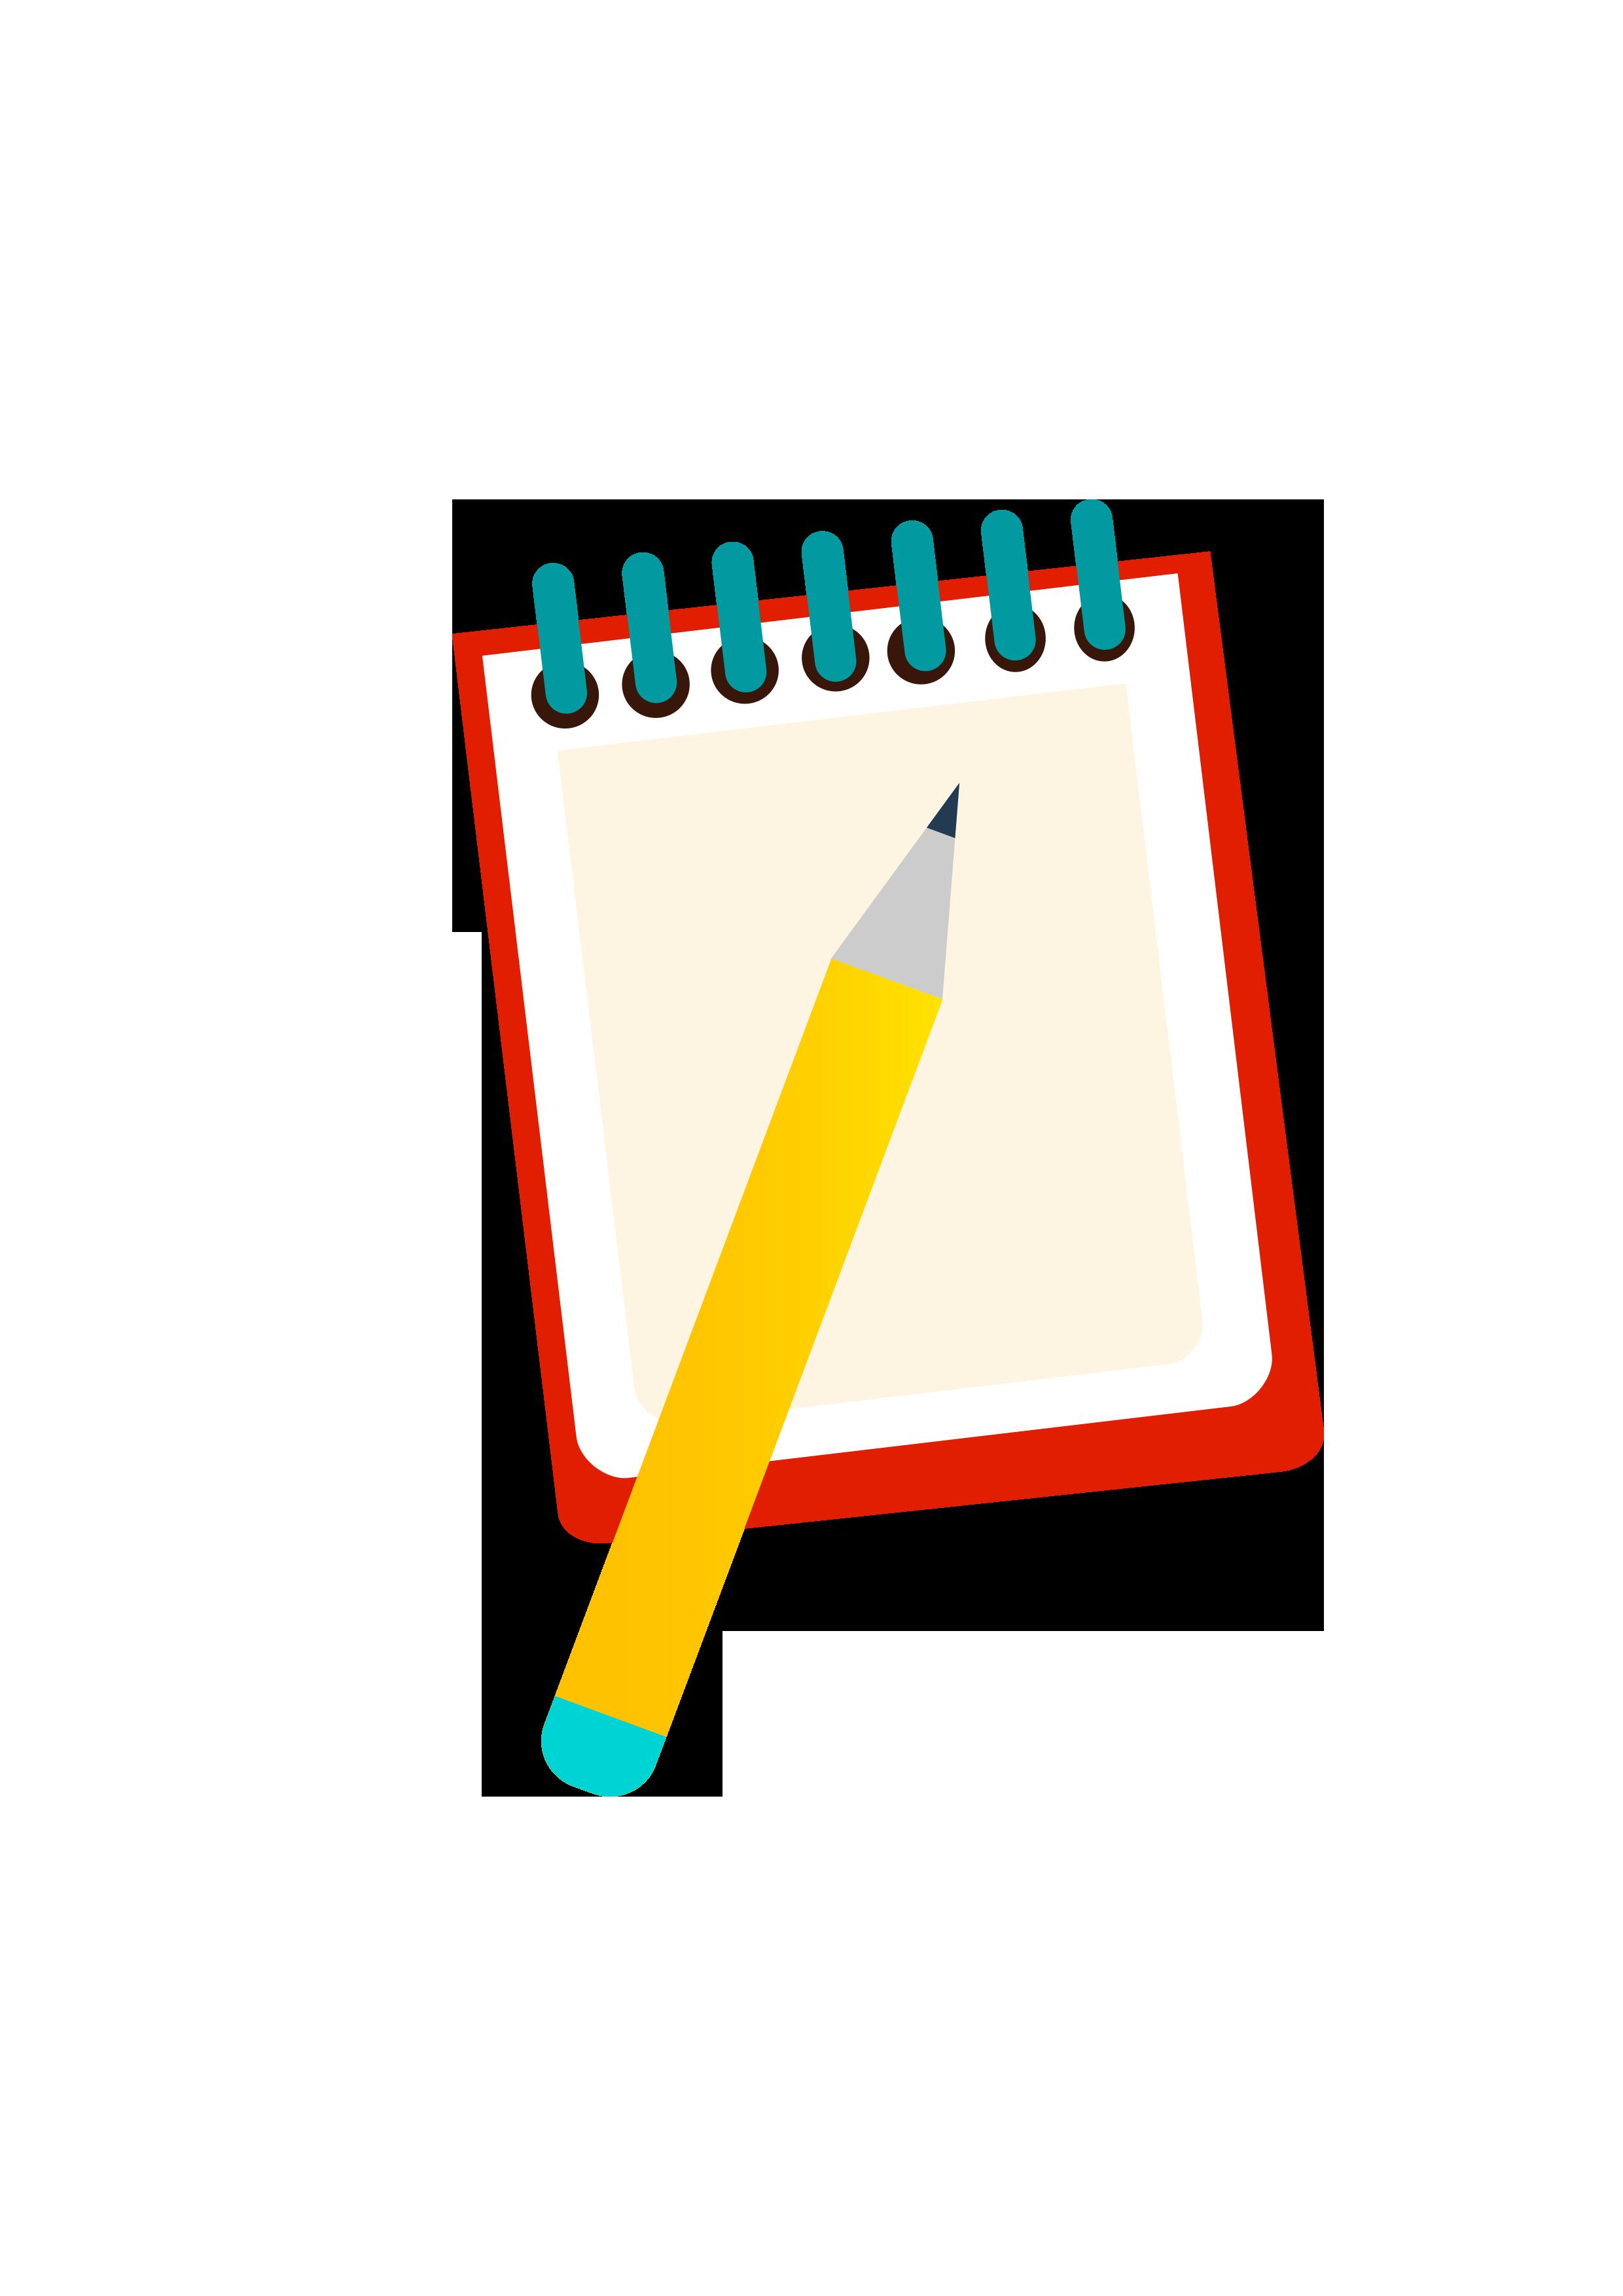 Laptop clip art notebook. Watermelon clipart triangle sandwich